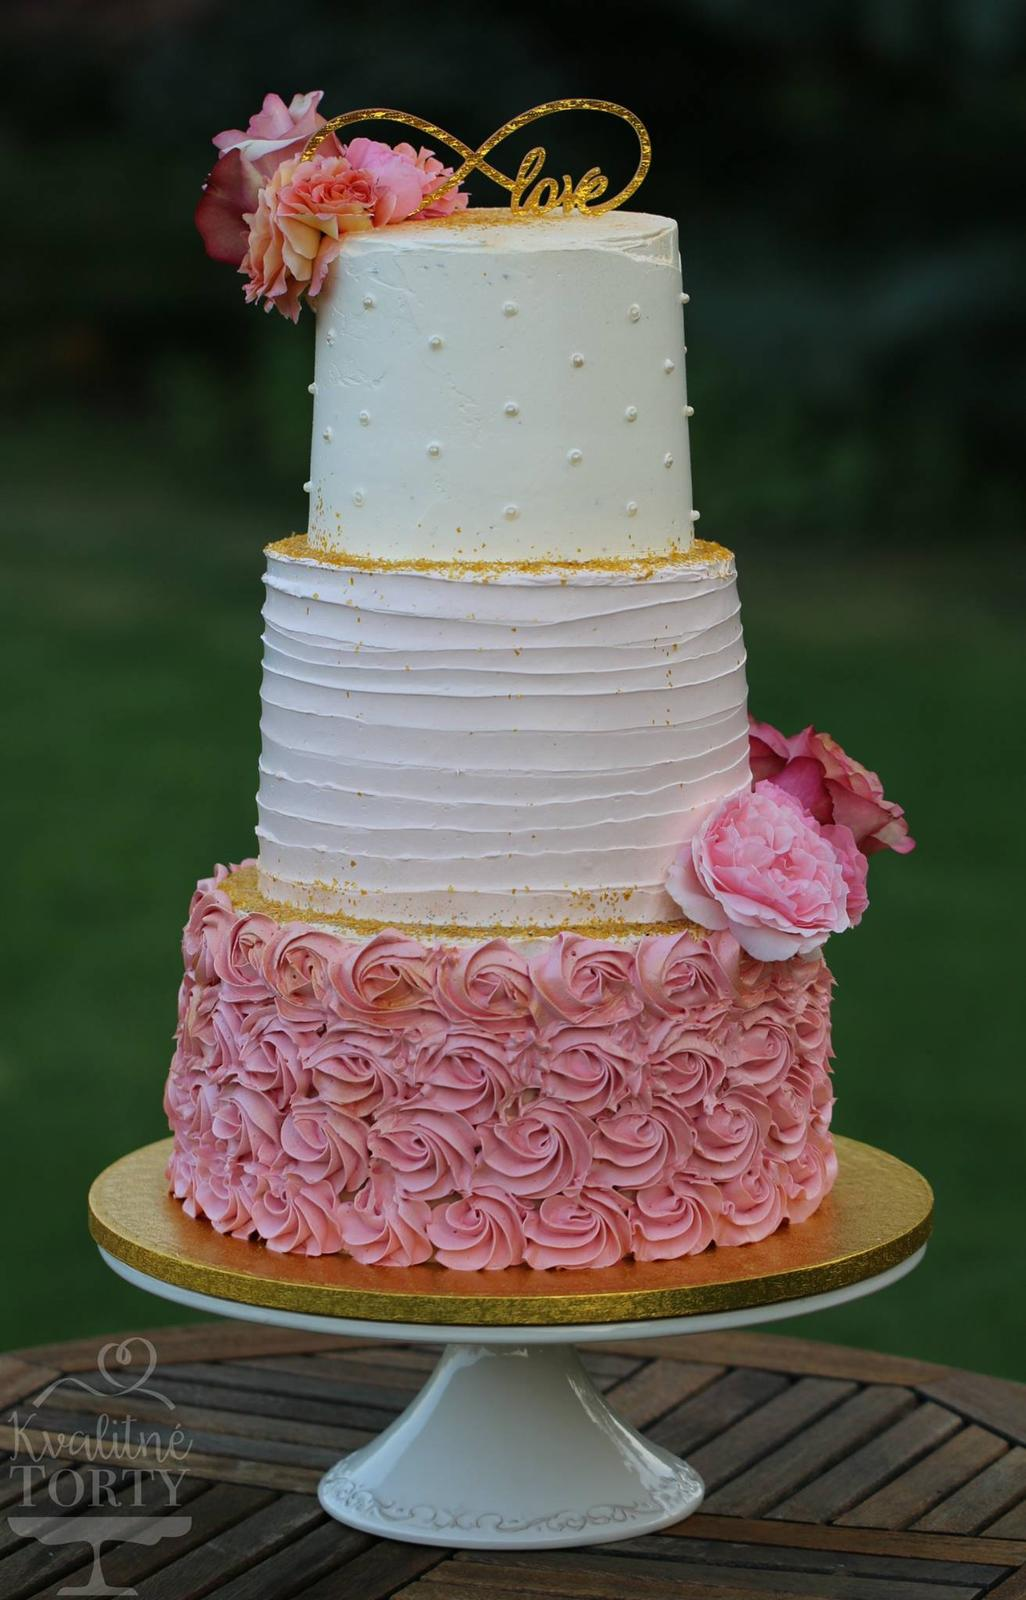 Naša ružovo-zlatá svadobná výzdoba od FlorDeLuxe - svadobná torta - upiekla nám ju šikovná pani Cviková - Kvalitné torty